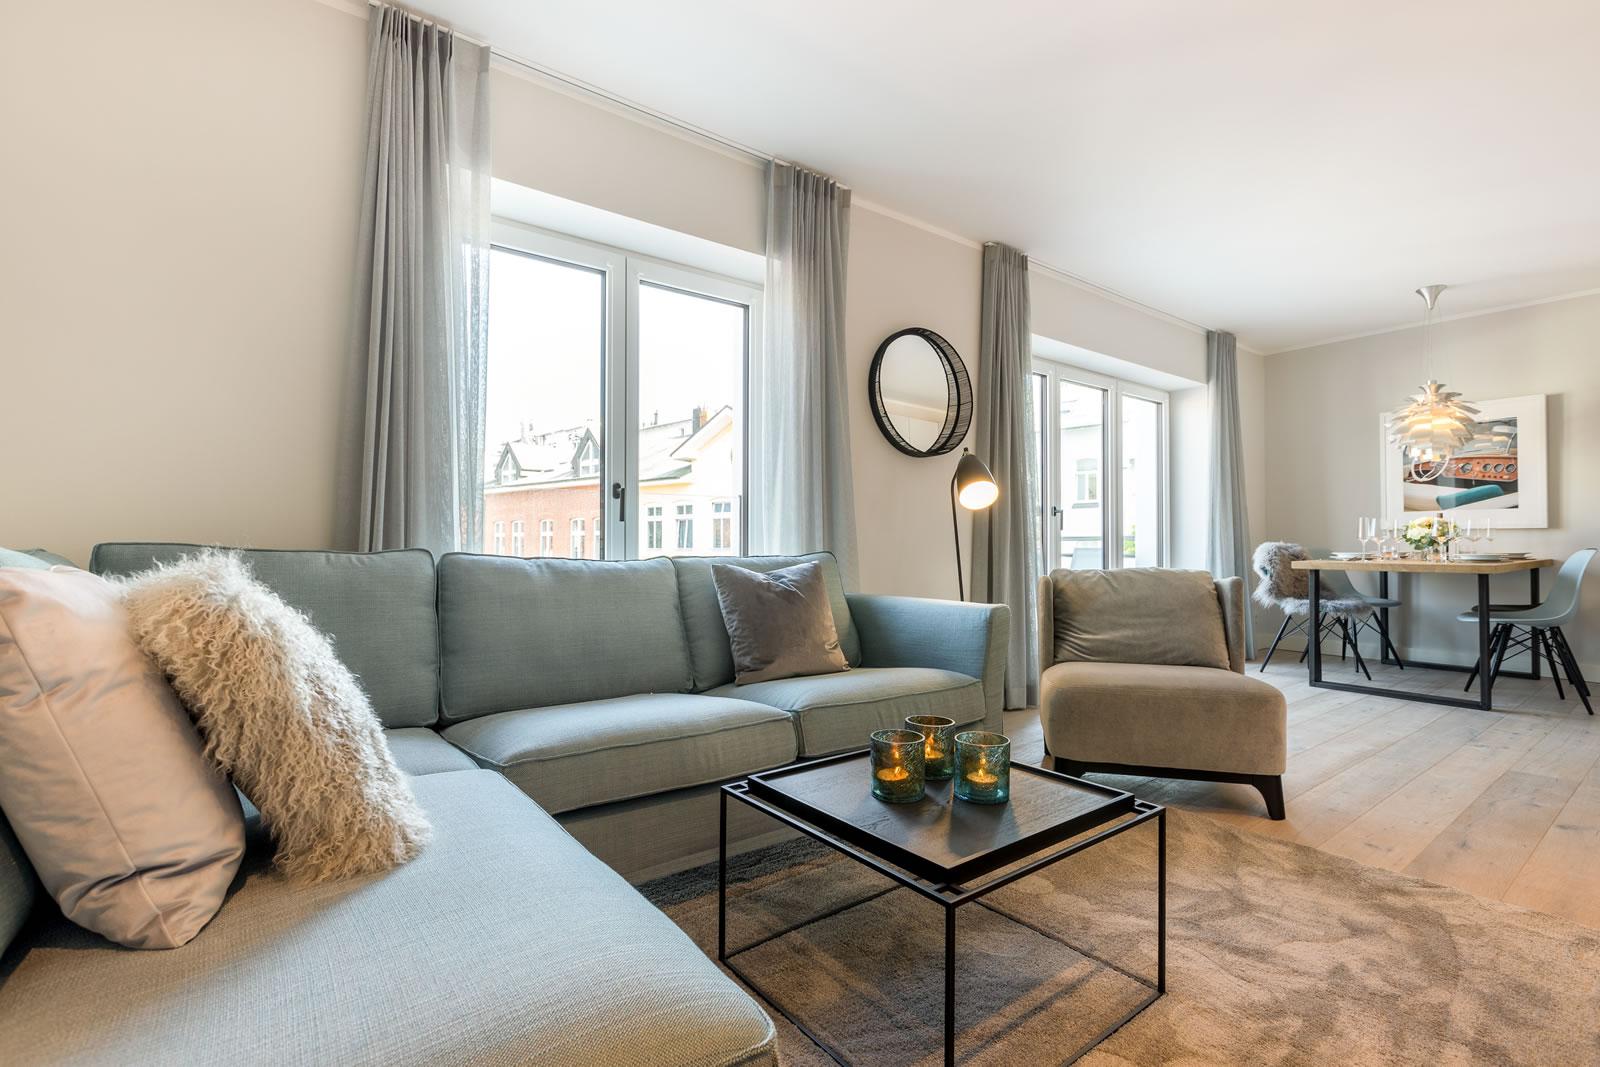 Sylter-Stadtperle-Wohnung-2-14